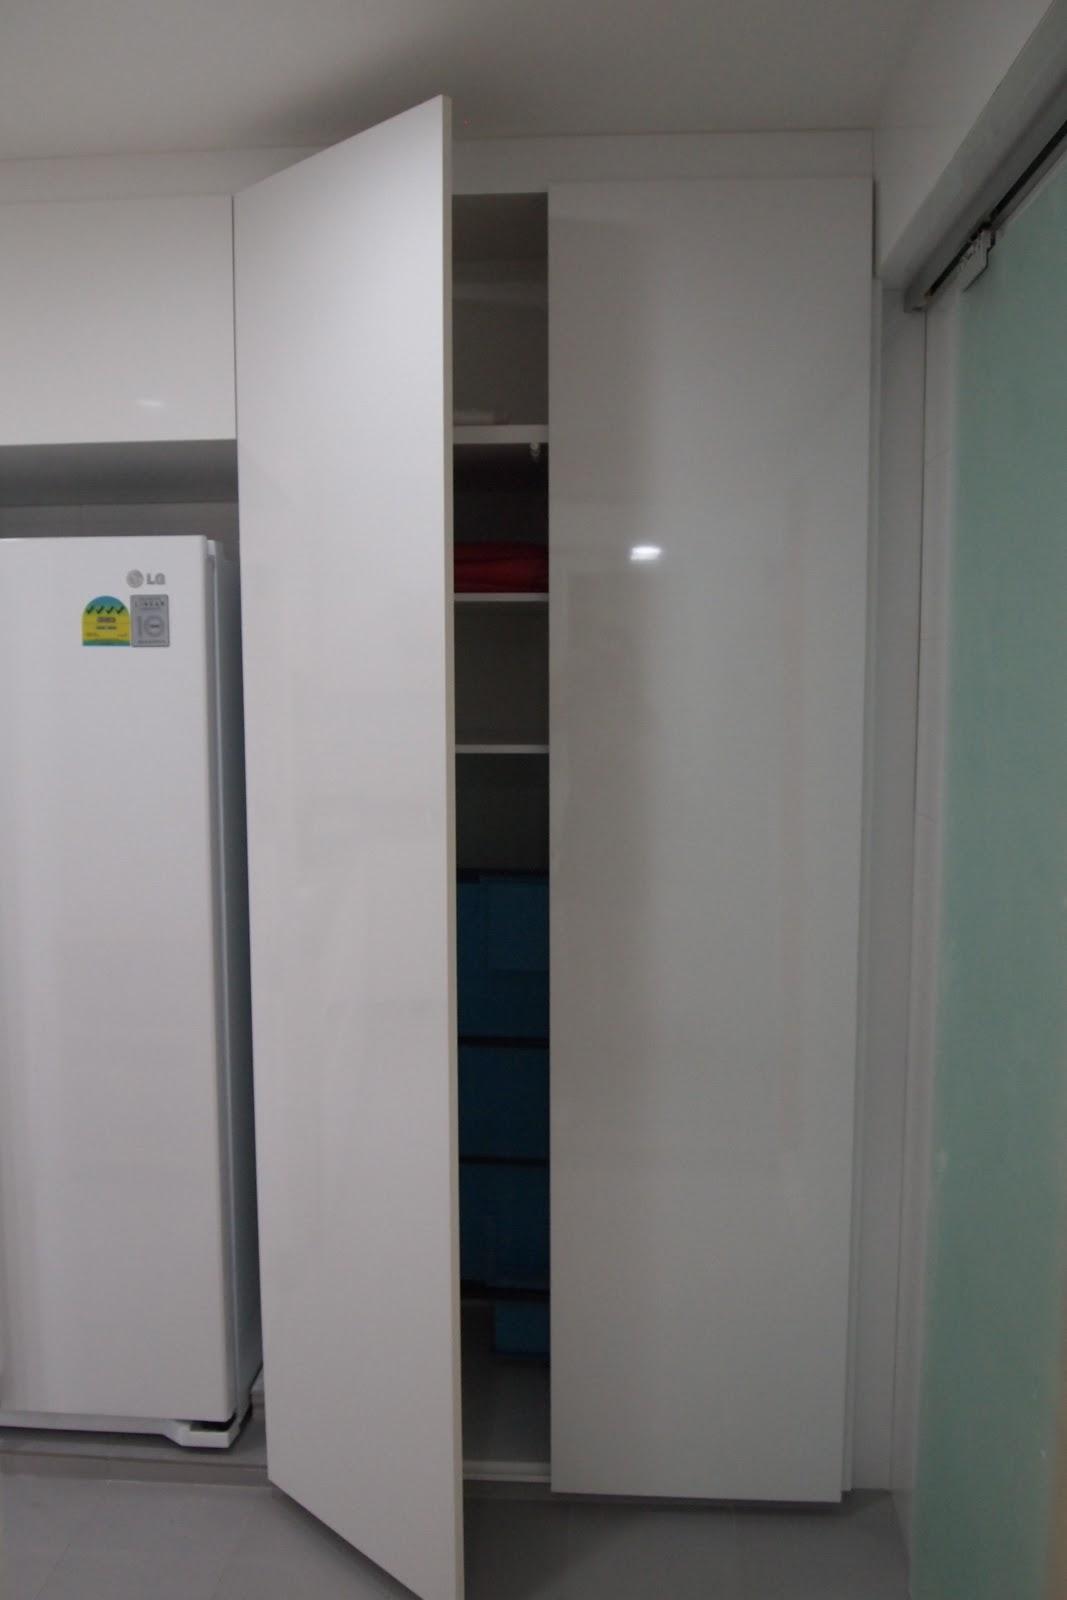 Refurbish Old Kitchen Cabinets Singapore